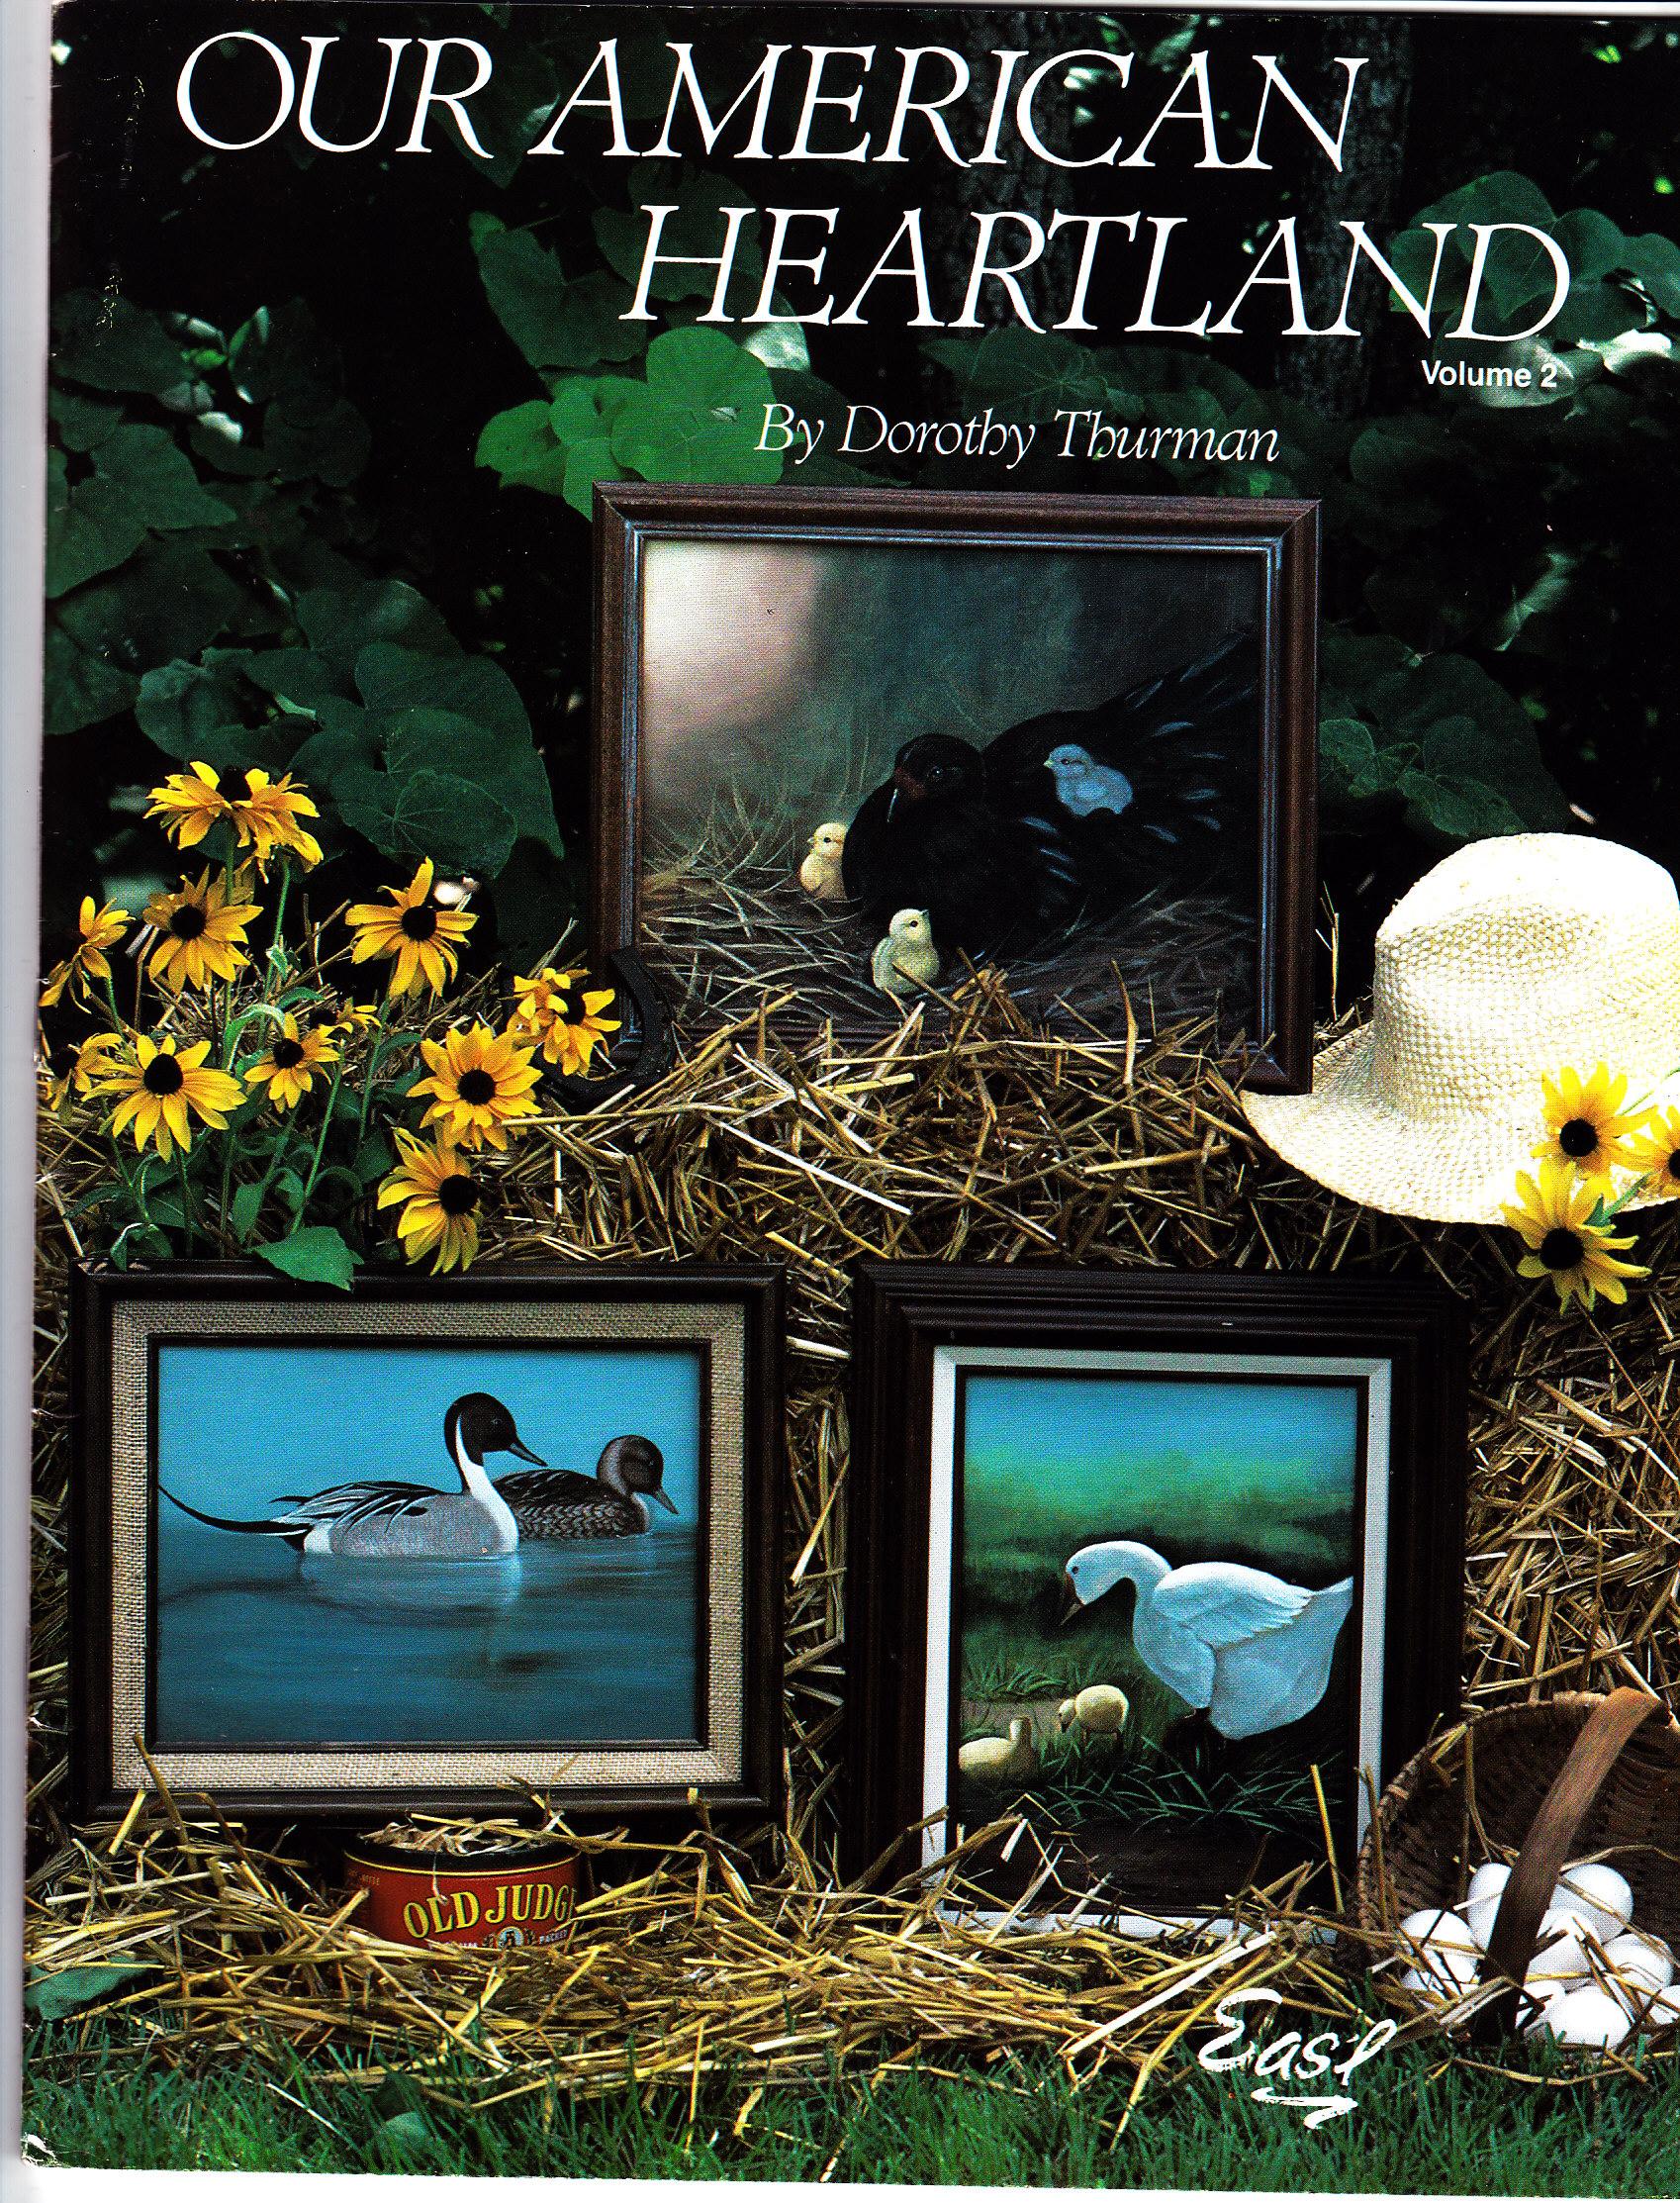 Our American Heartland vol2 - Dorothy Thurman